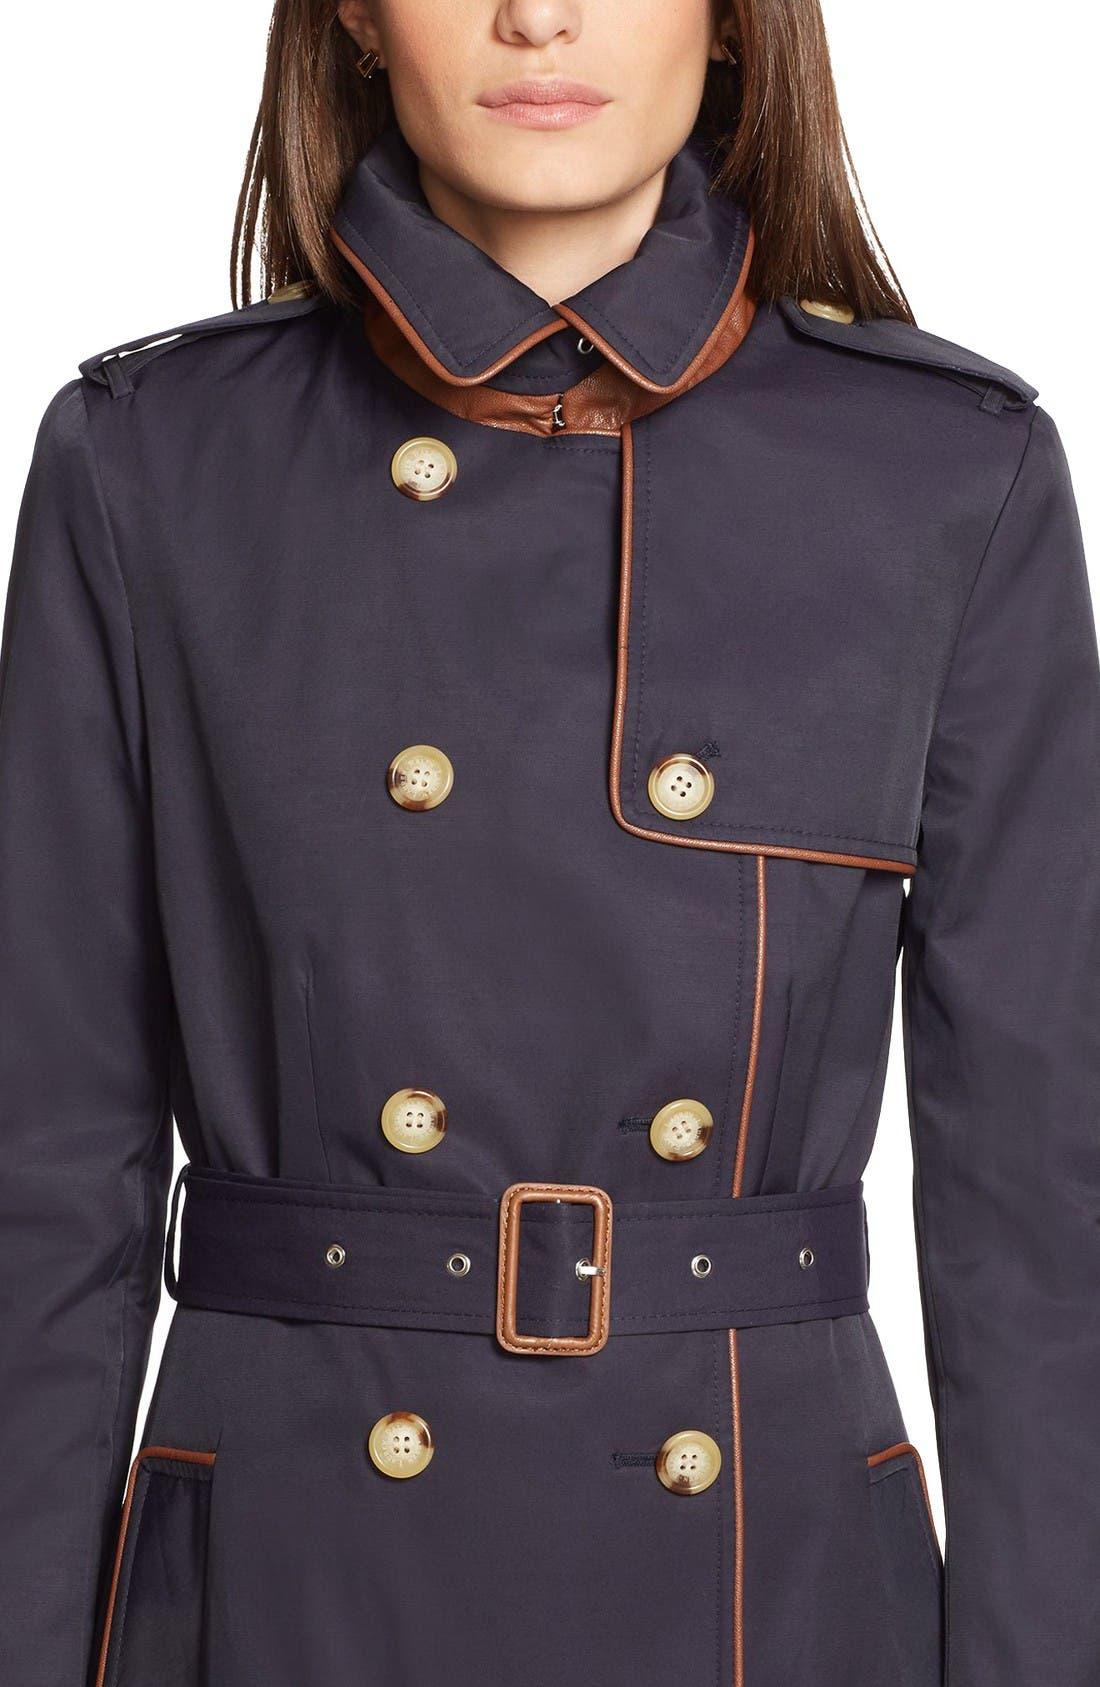 Alternate Image 3  - Lauren Ralph Lauren Faux Leather Trim Trench Coat (Regular & Petite)